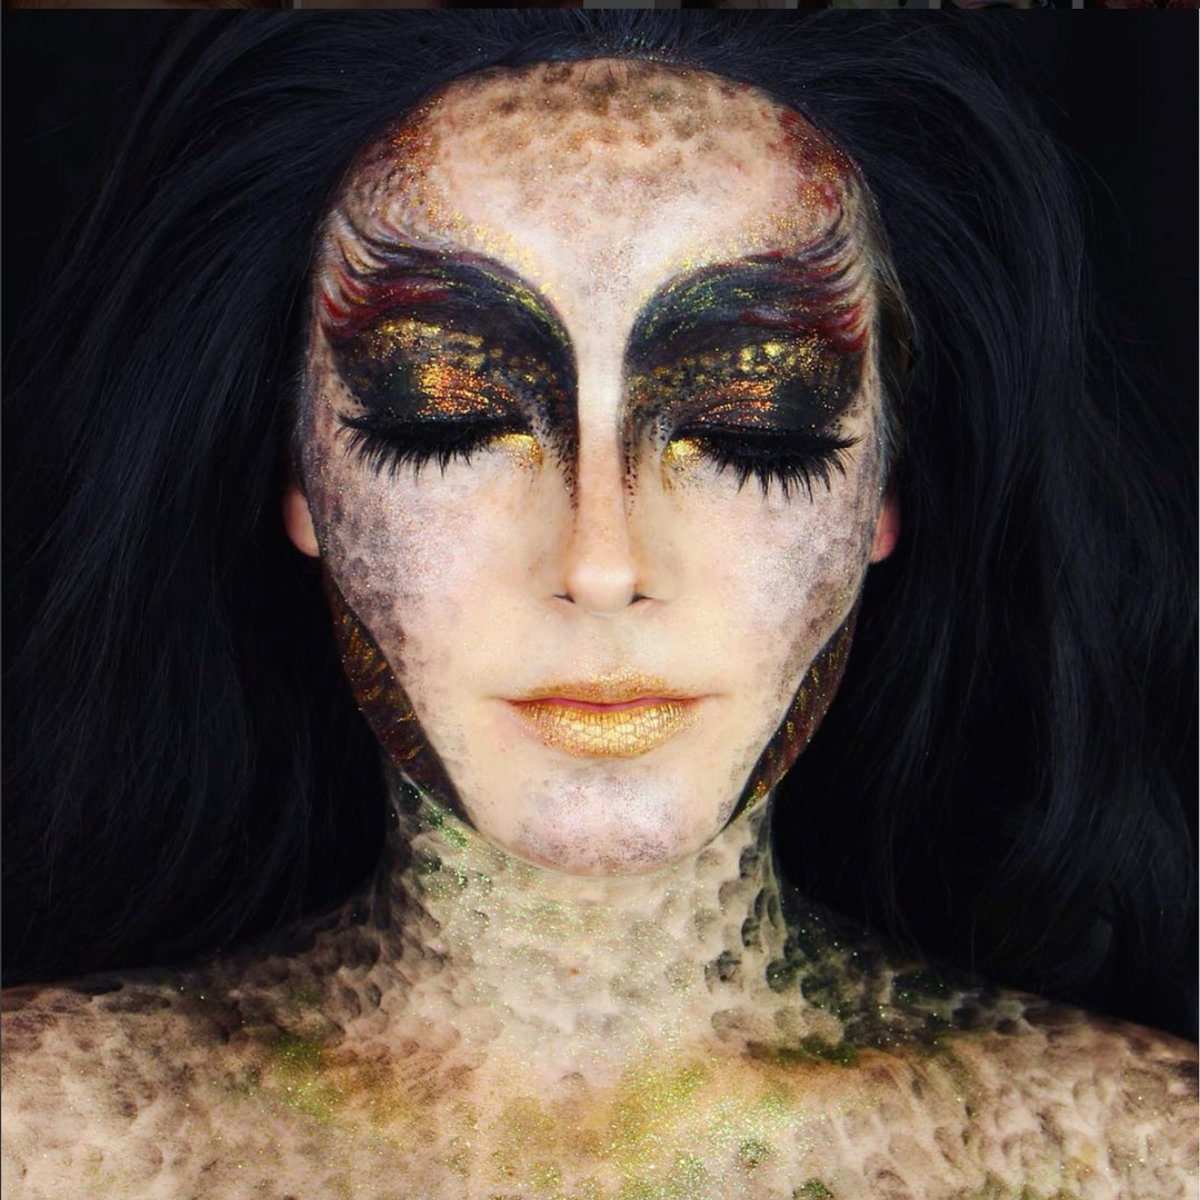 Макияж на лице хэллоуин красиво